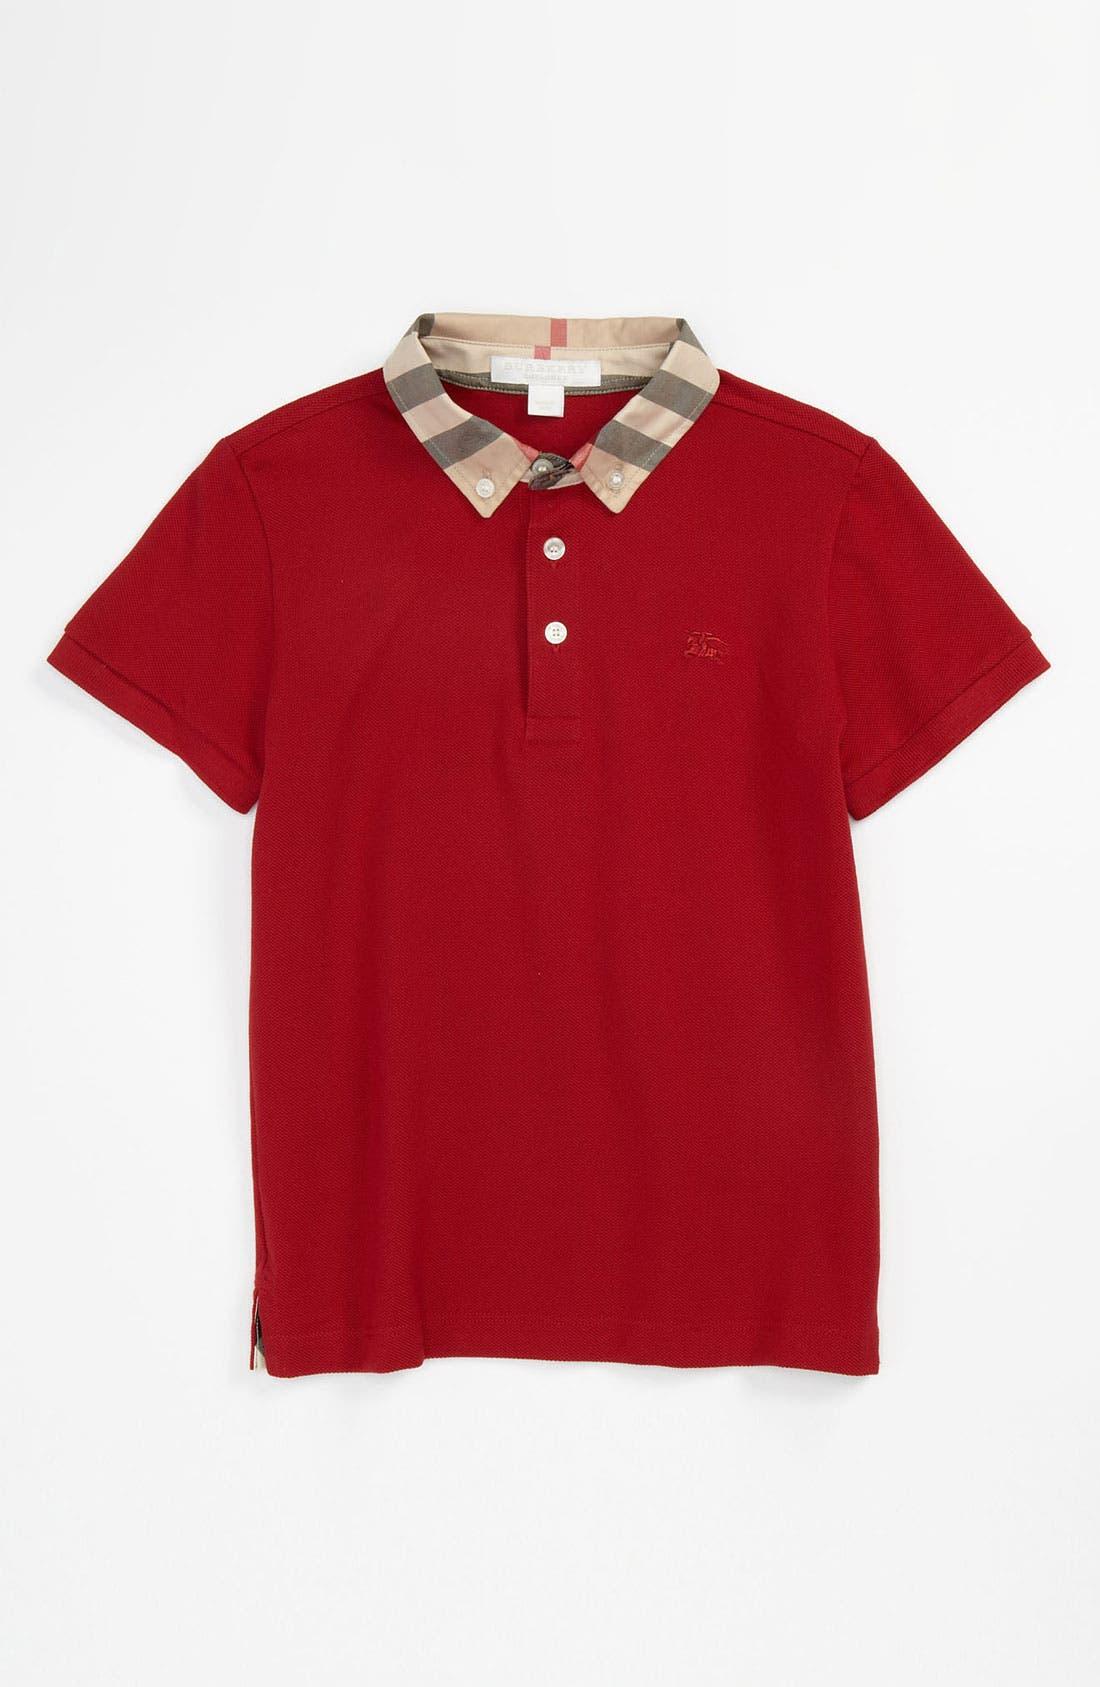 Alternate Image 1 Selected - Burberry Check Collar Polo (Toddler, Little Boys & Big Boys)